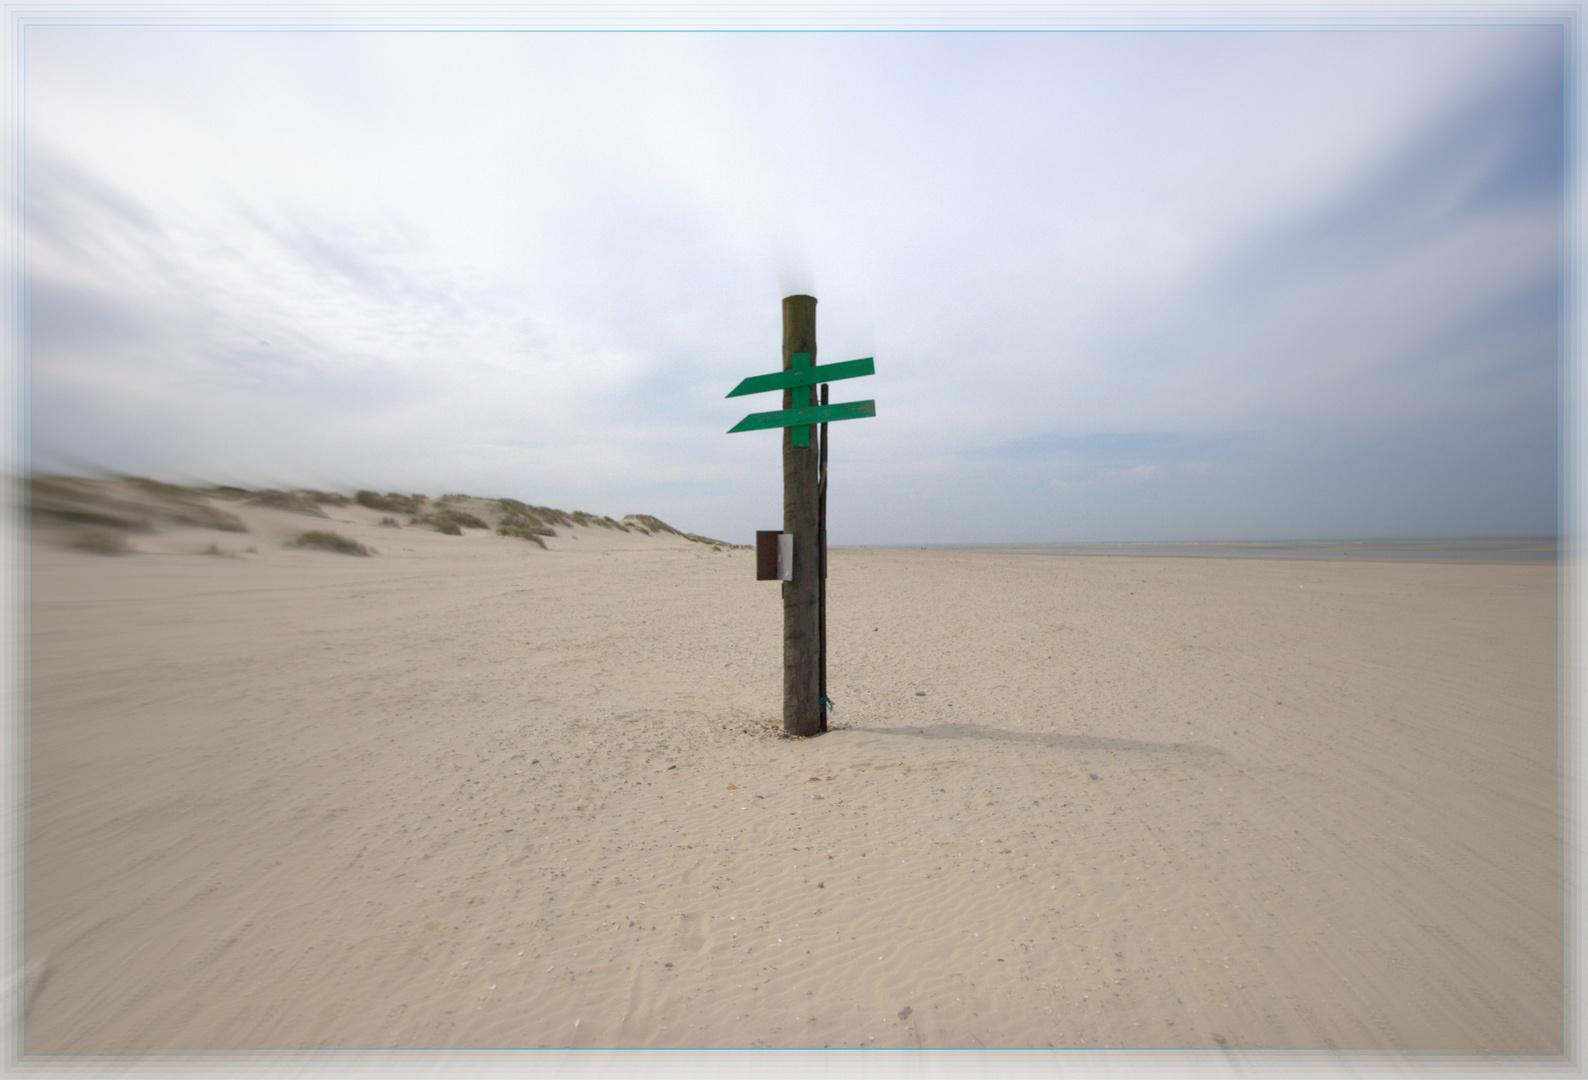 - Erde - Europa - Nordsee - Baltrum - Naturstrand